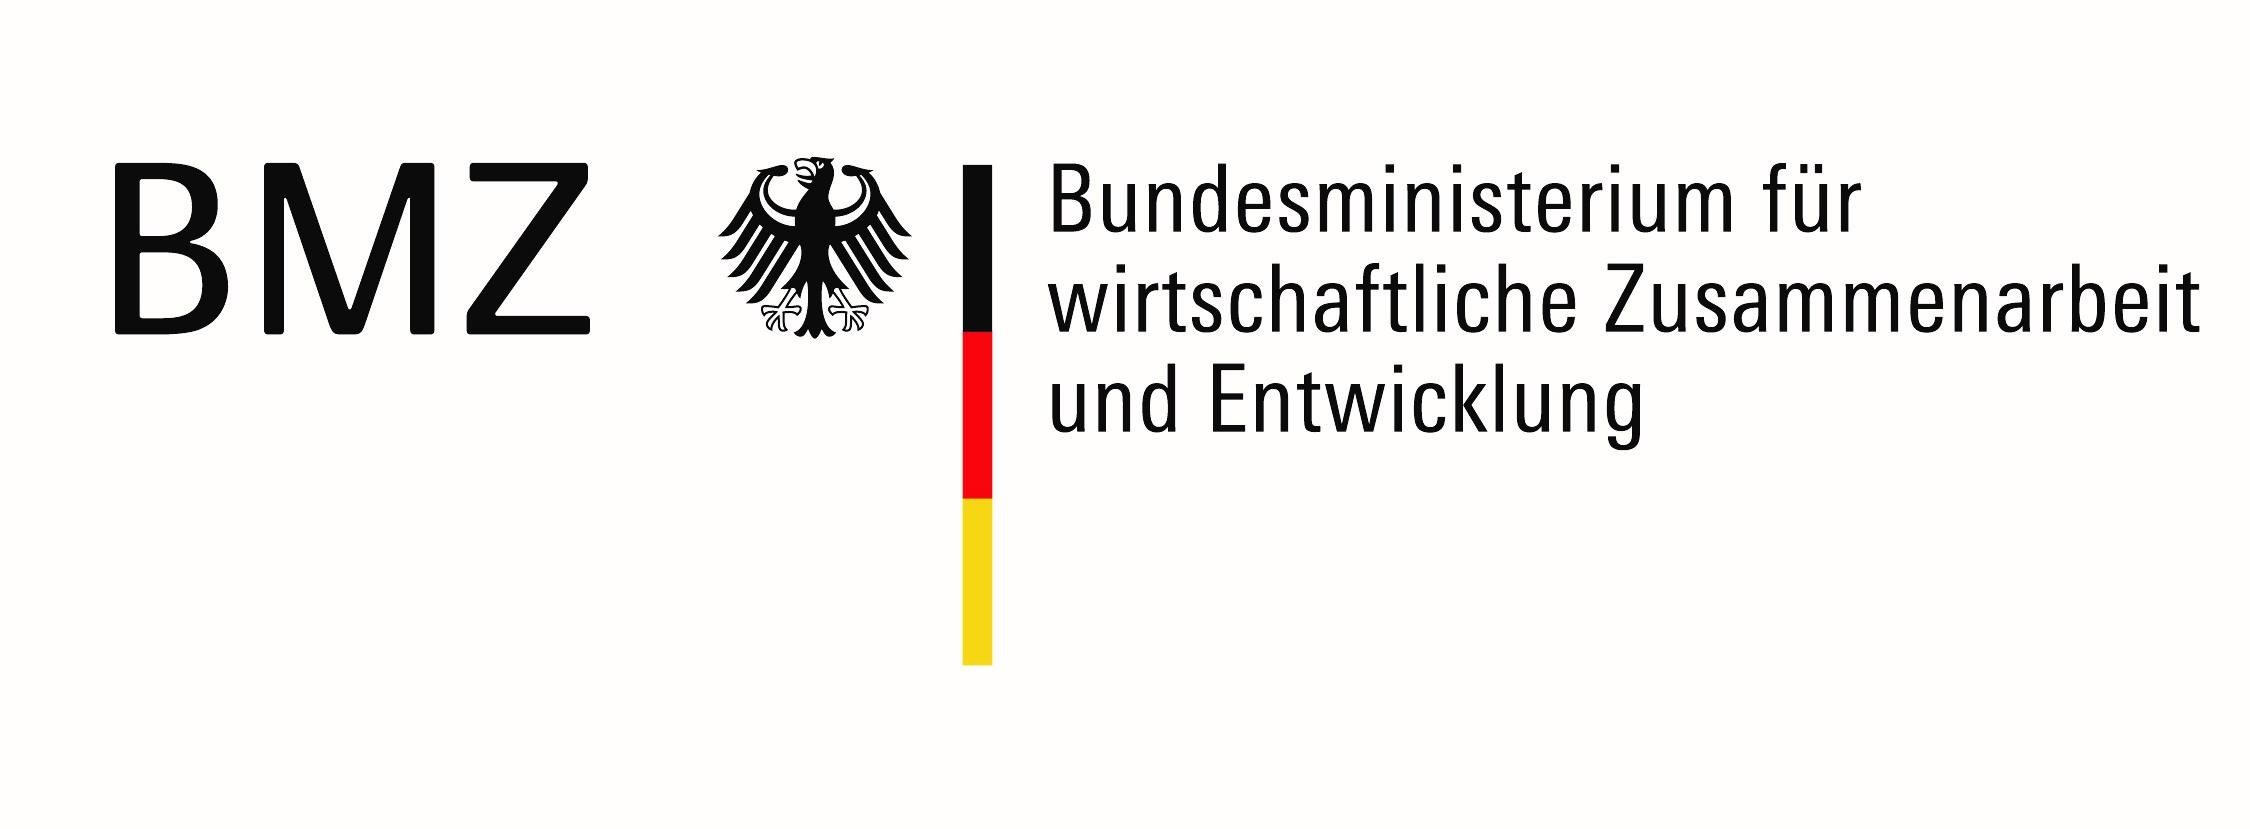 bmz_logo_2019.jpg